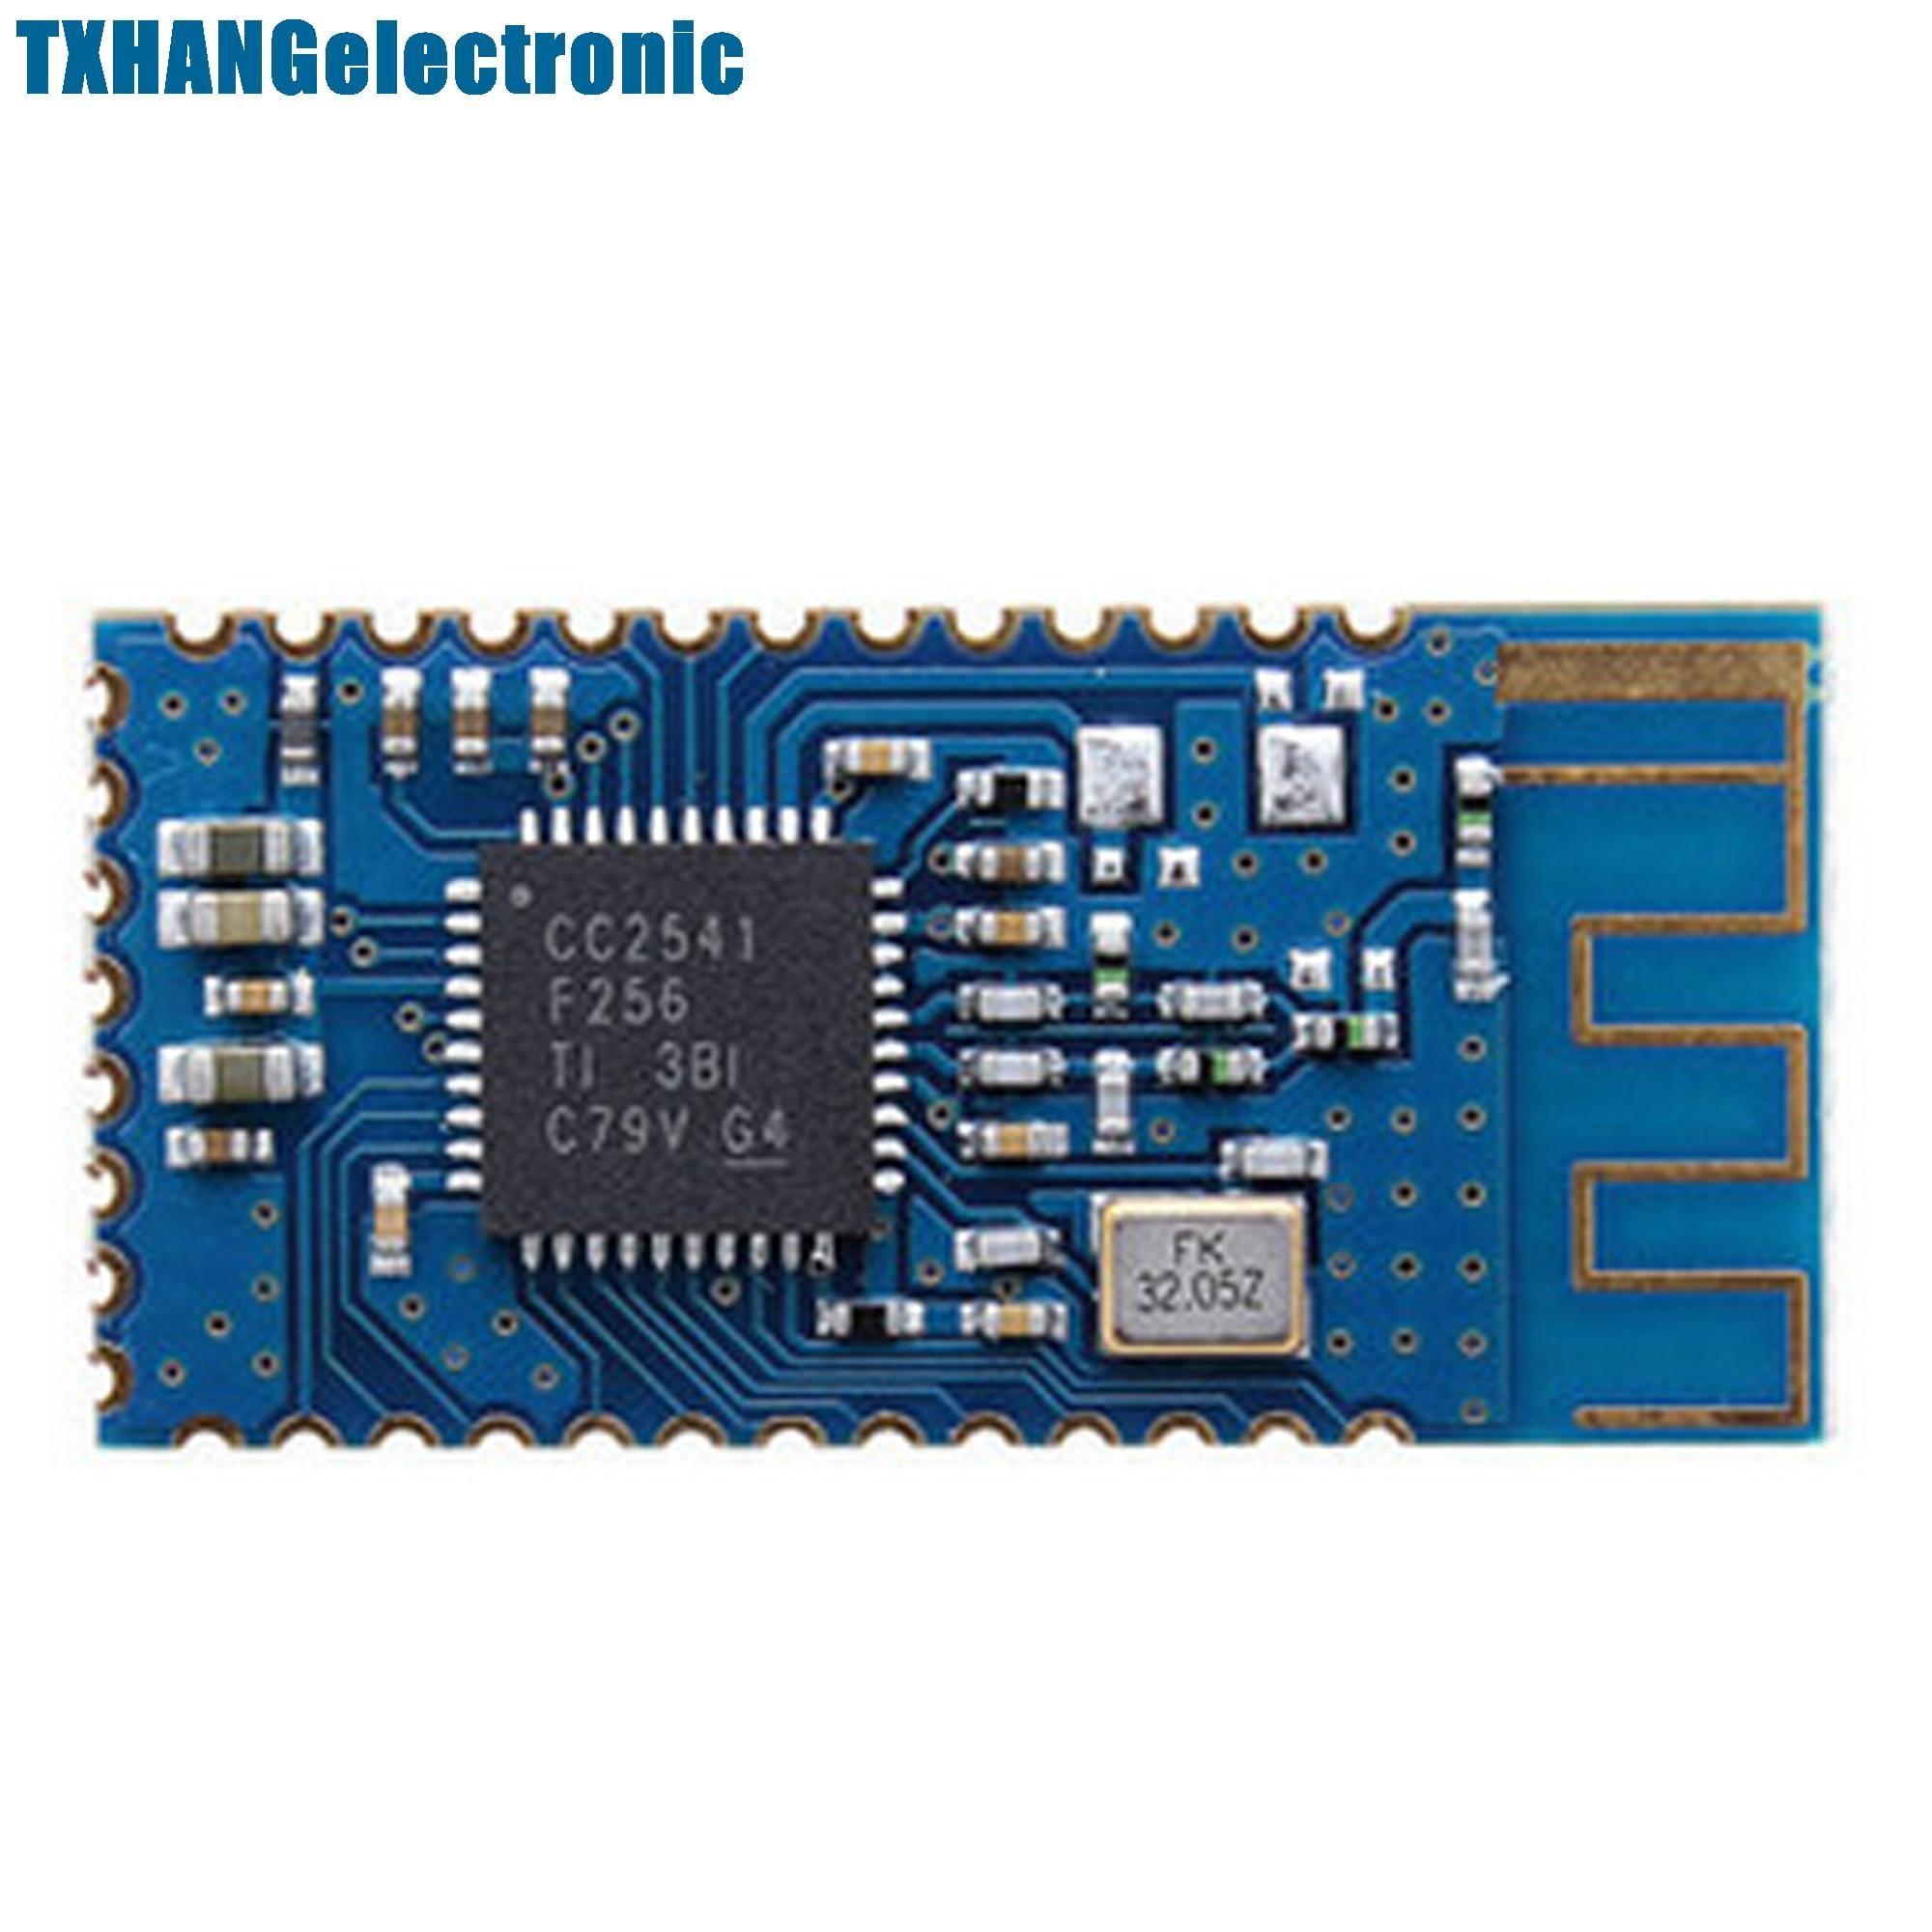 HM-10 CC2541 CC2540 4 0Bluetooth UART Transceiver Module